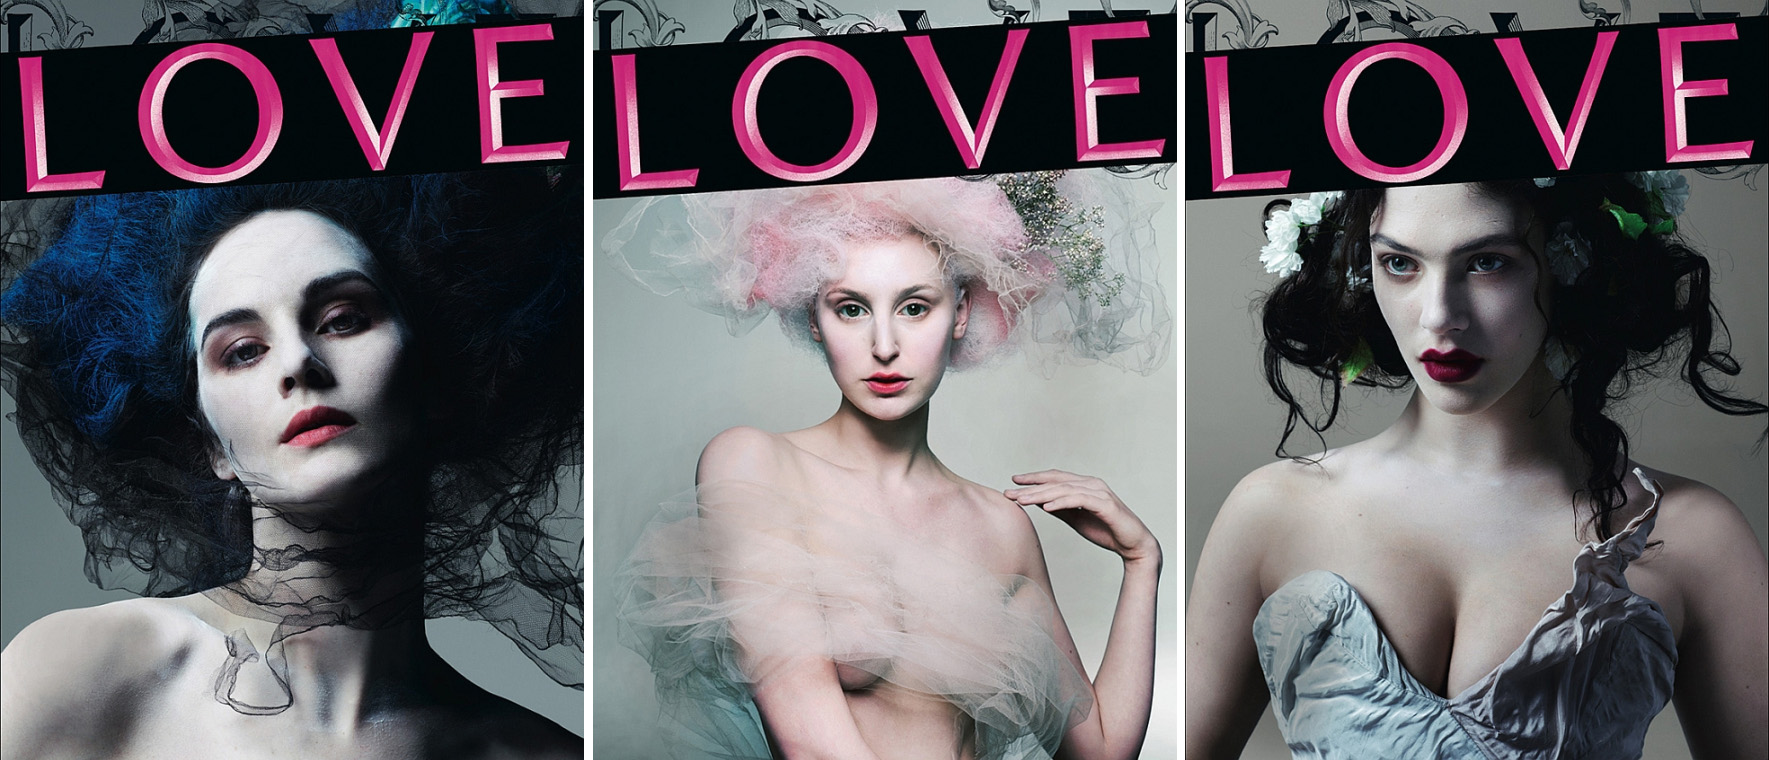 Downton-Abbey-Girls-Lady-Mary-Lady-Edith-Lady-Sybil-in-Love-Magazine.jpg